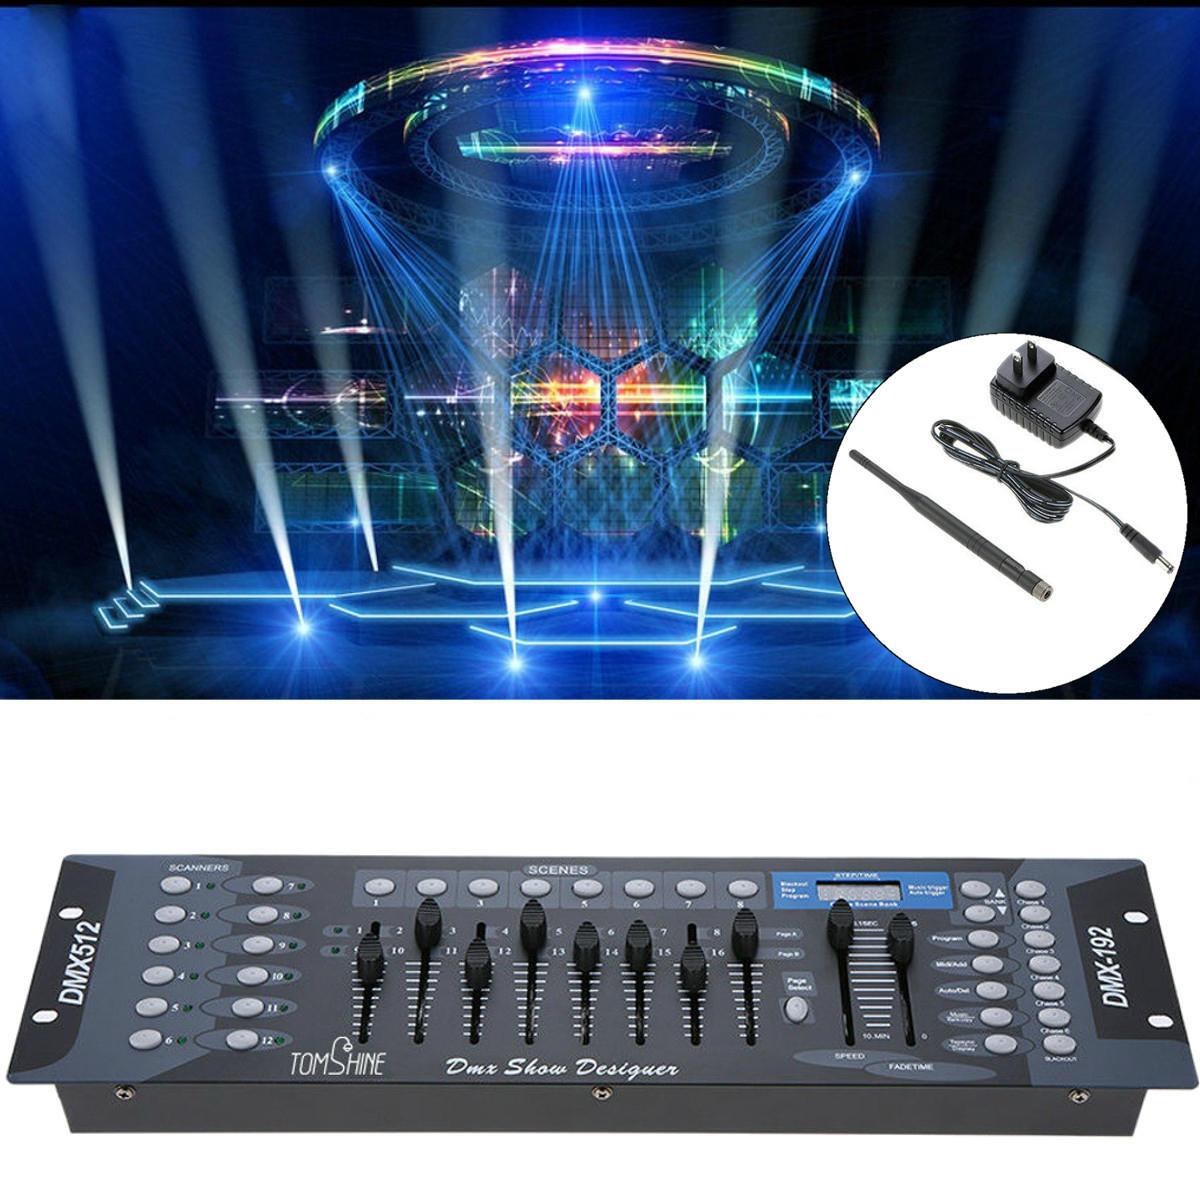 192 Channels Dmx512 Light Controller